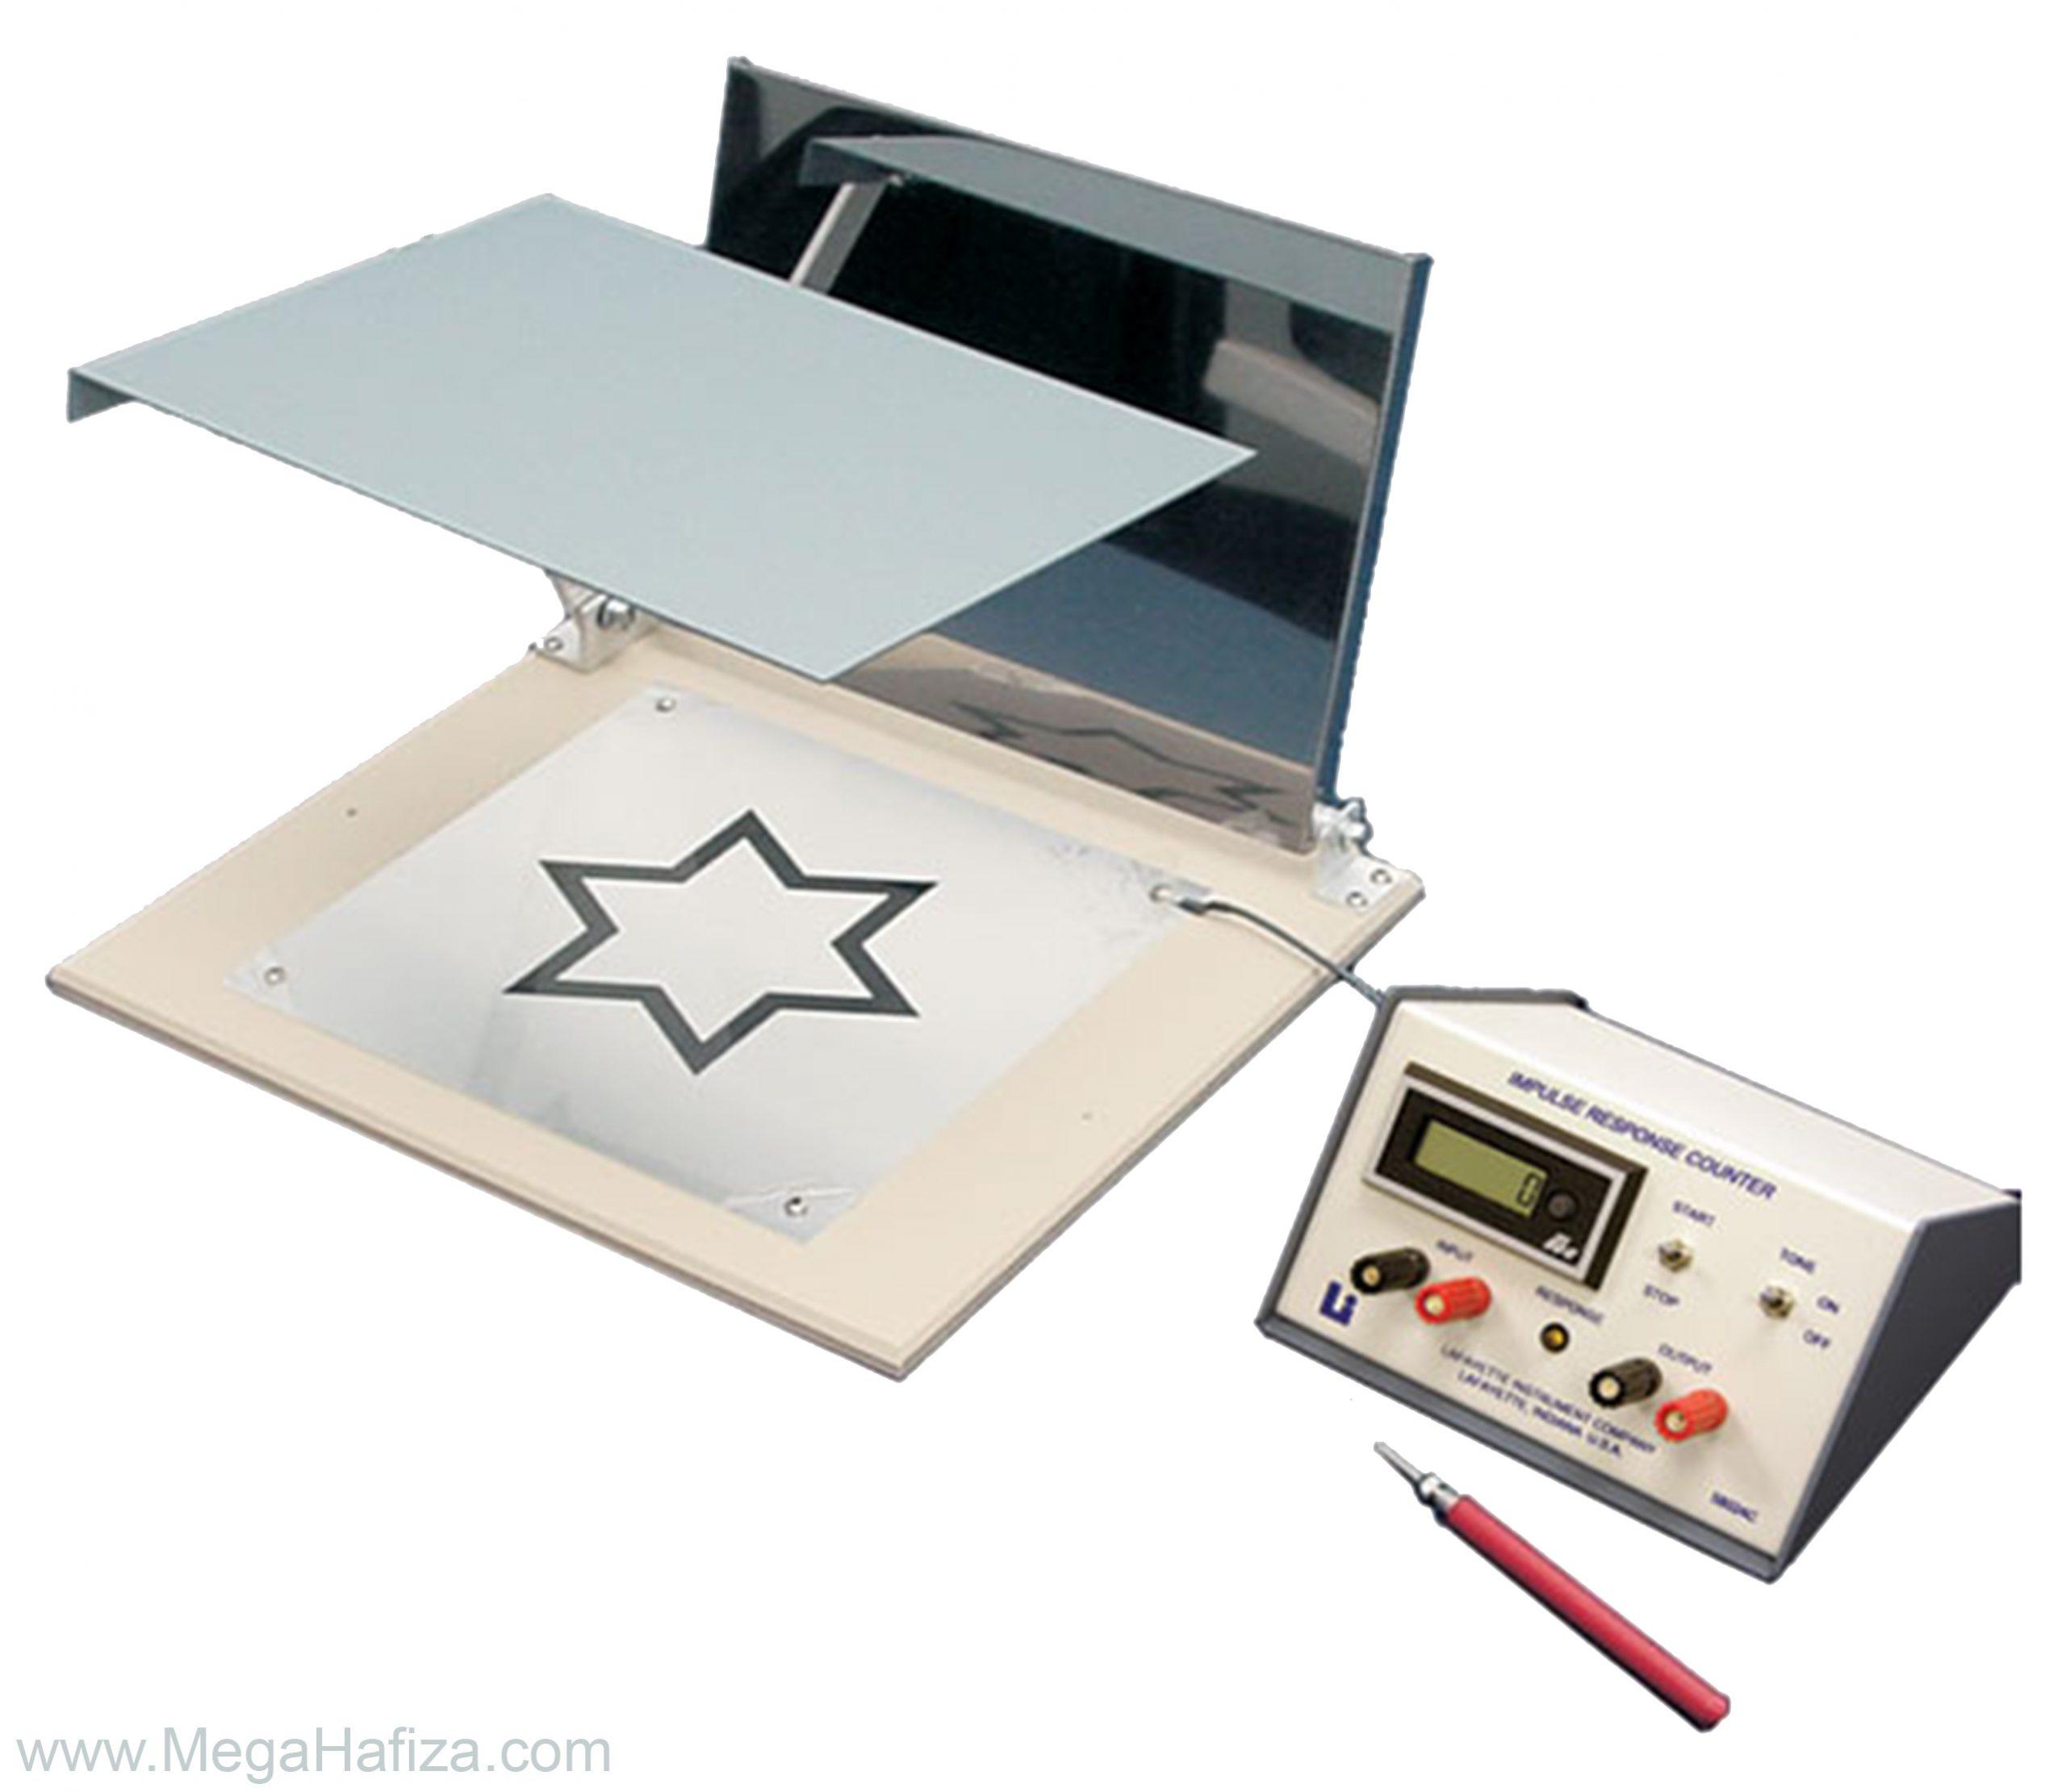 Automatic Scoring Mirror Tracer -Ayna Goruntusu ile Cizim Gorevi - Atomatik Skorlama Cihazı